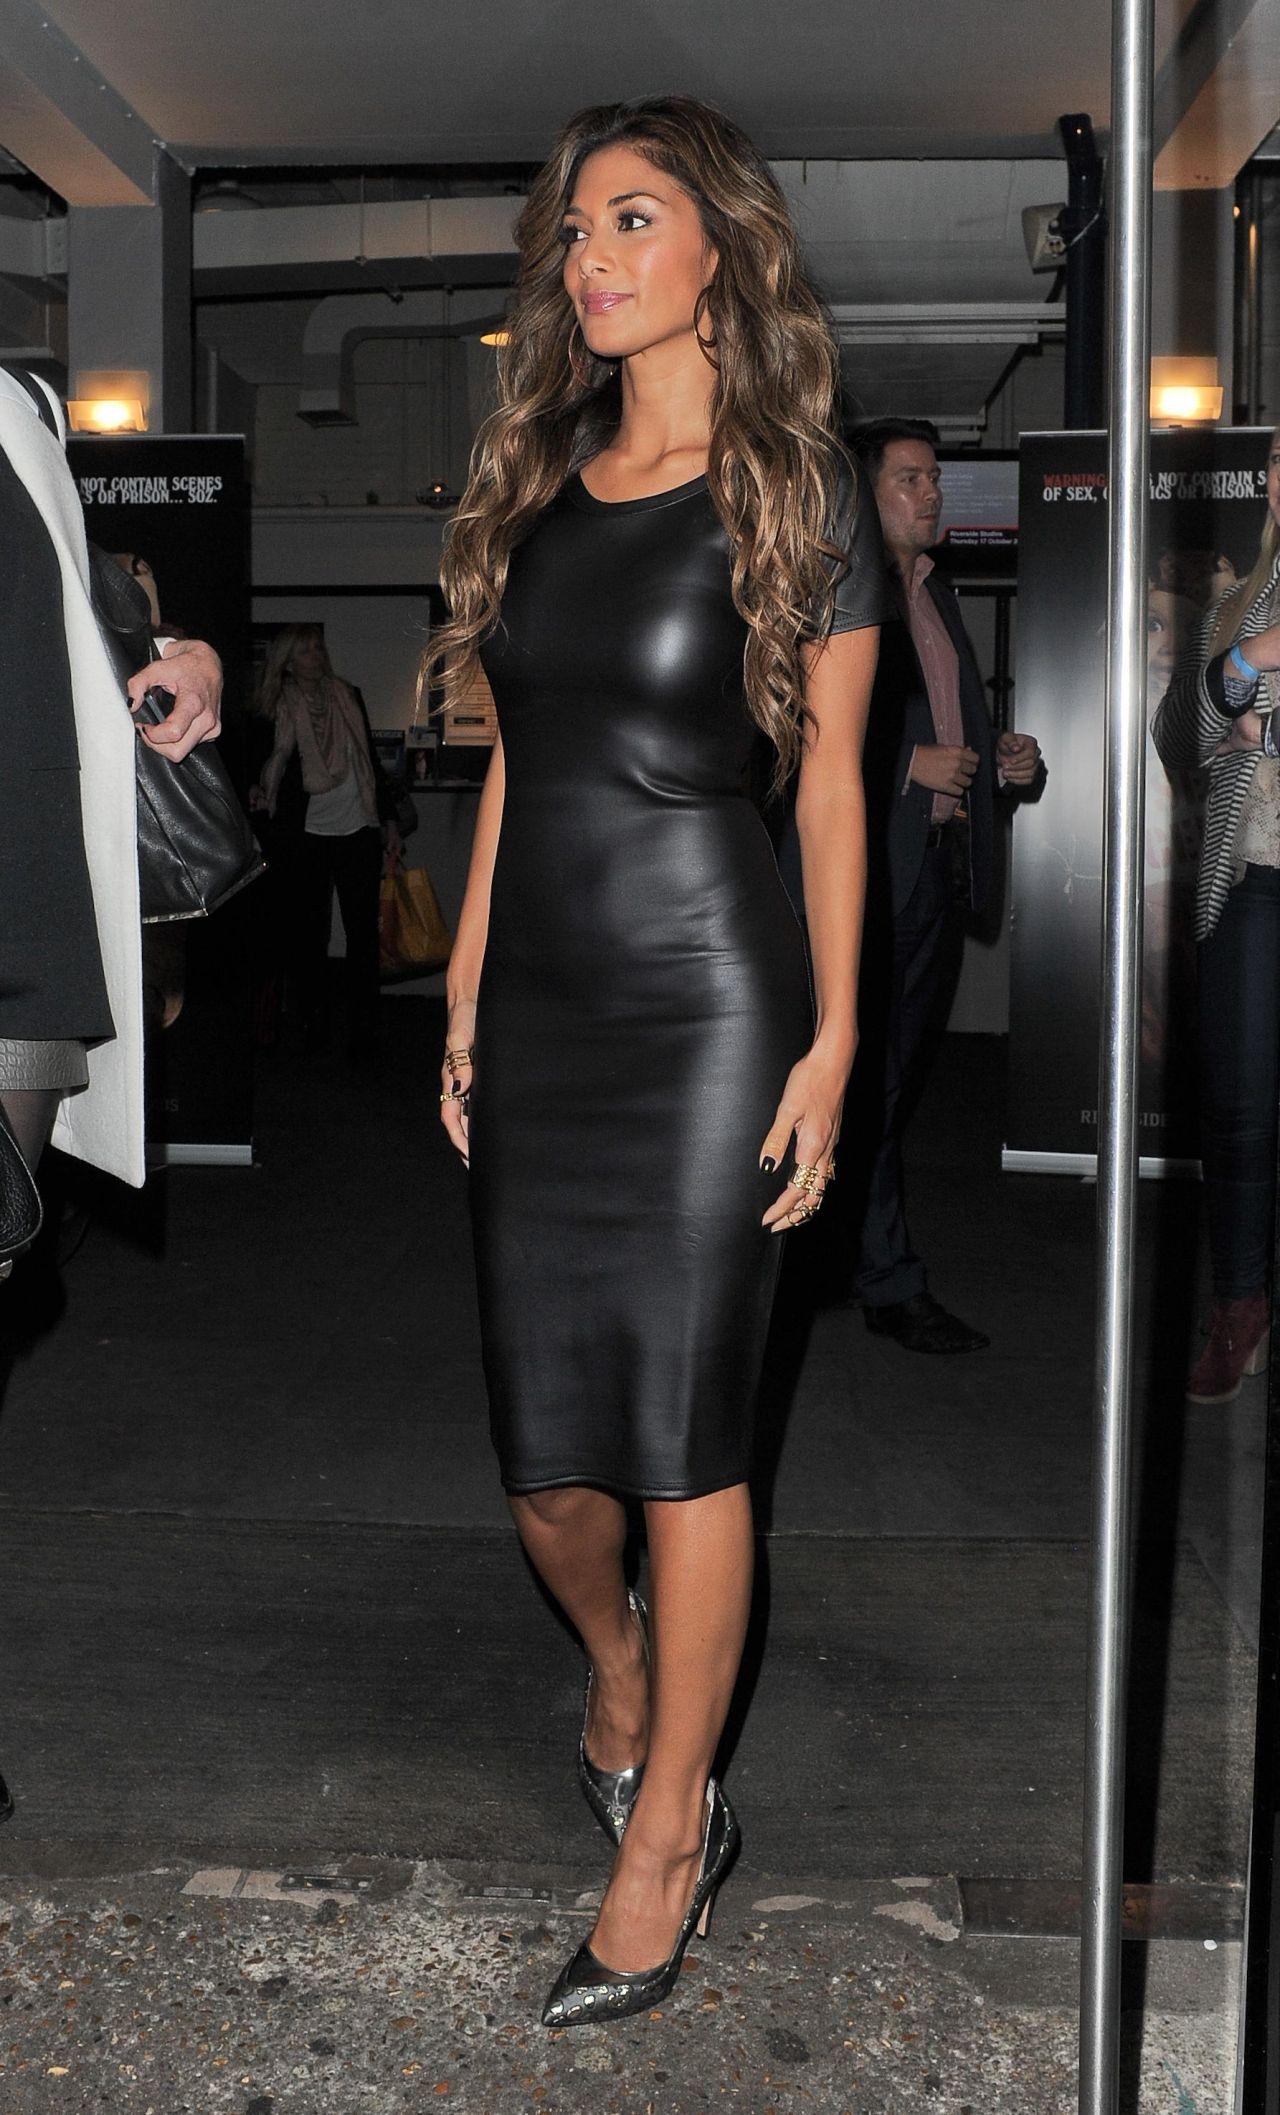 Nicole Scherzinger Street Style In Leather Dress